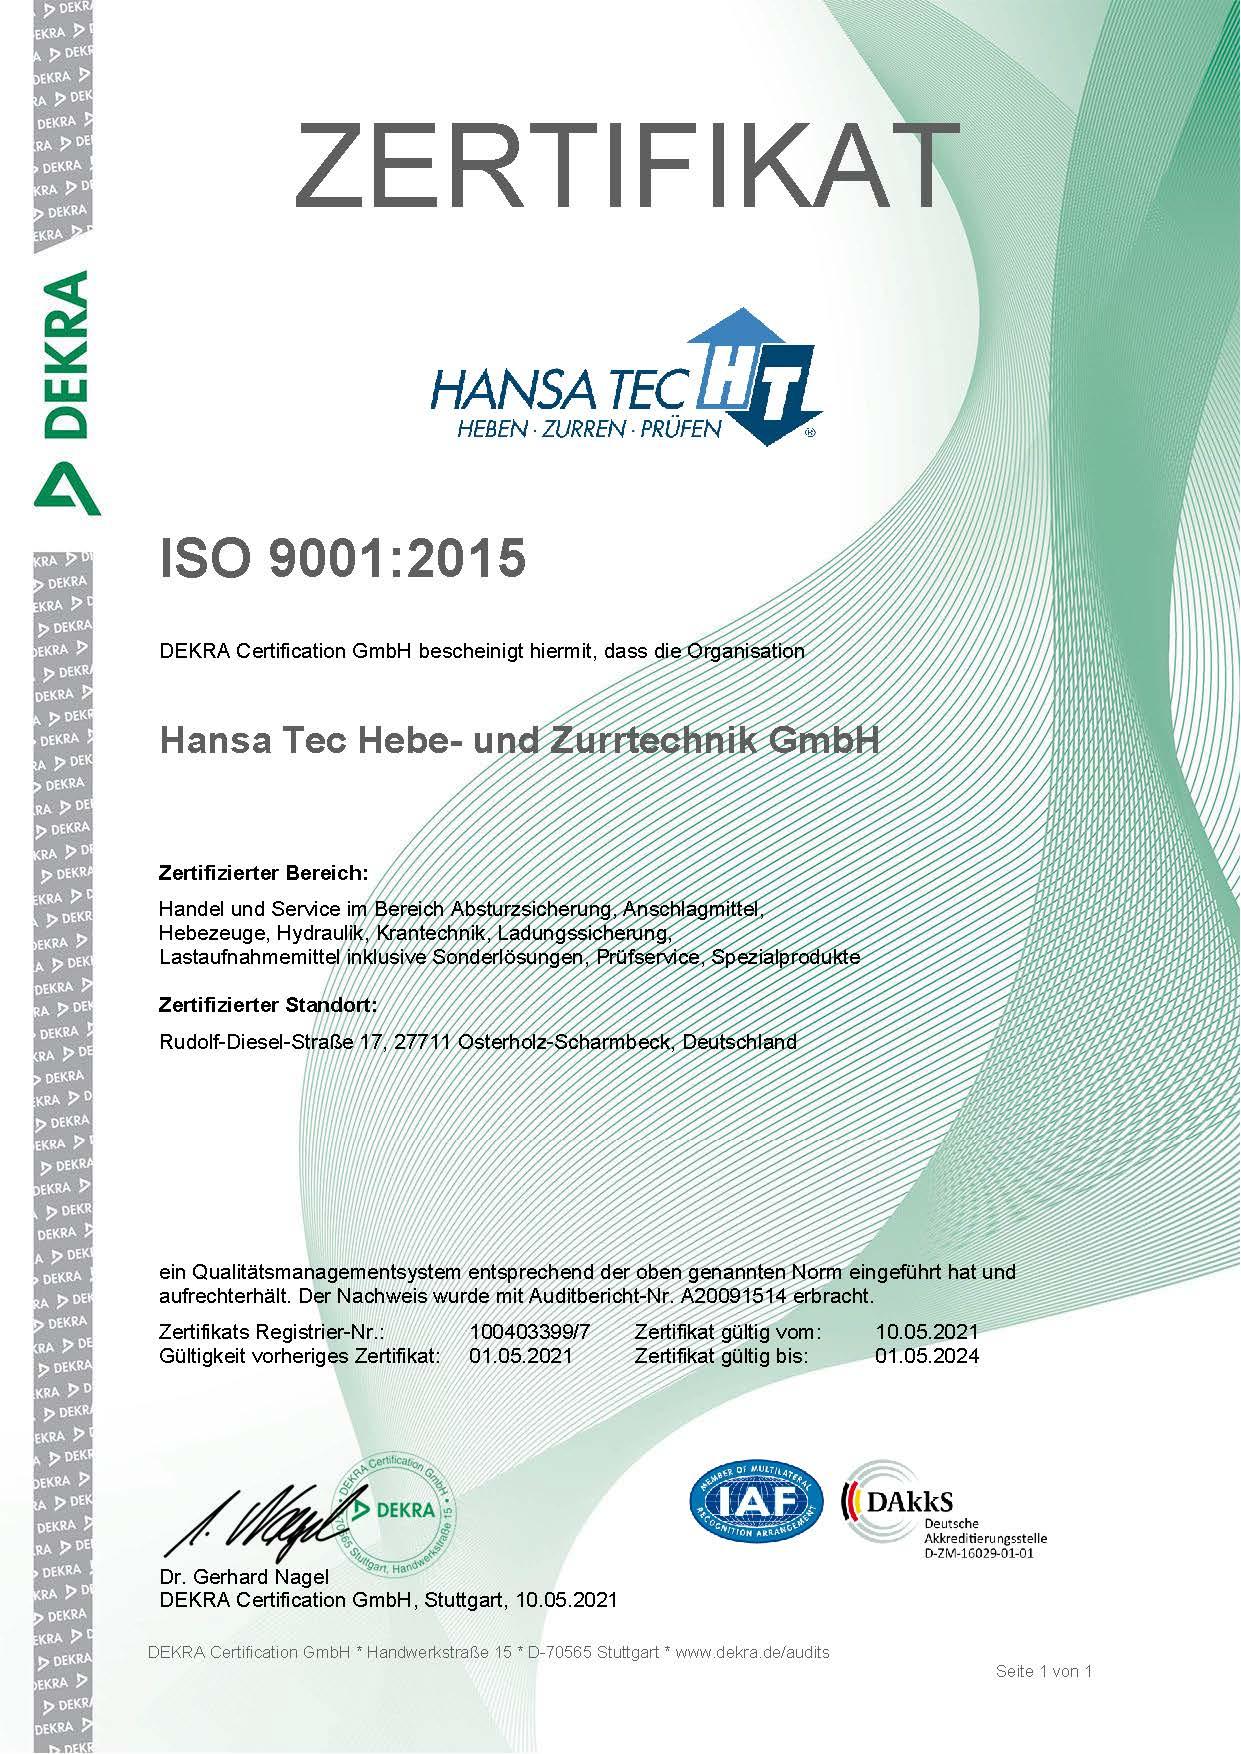 Zertifikat 100403399 7 ger